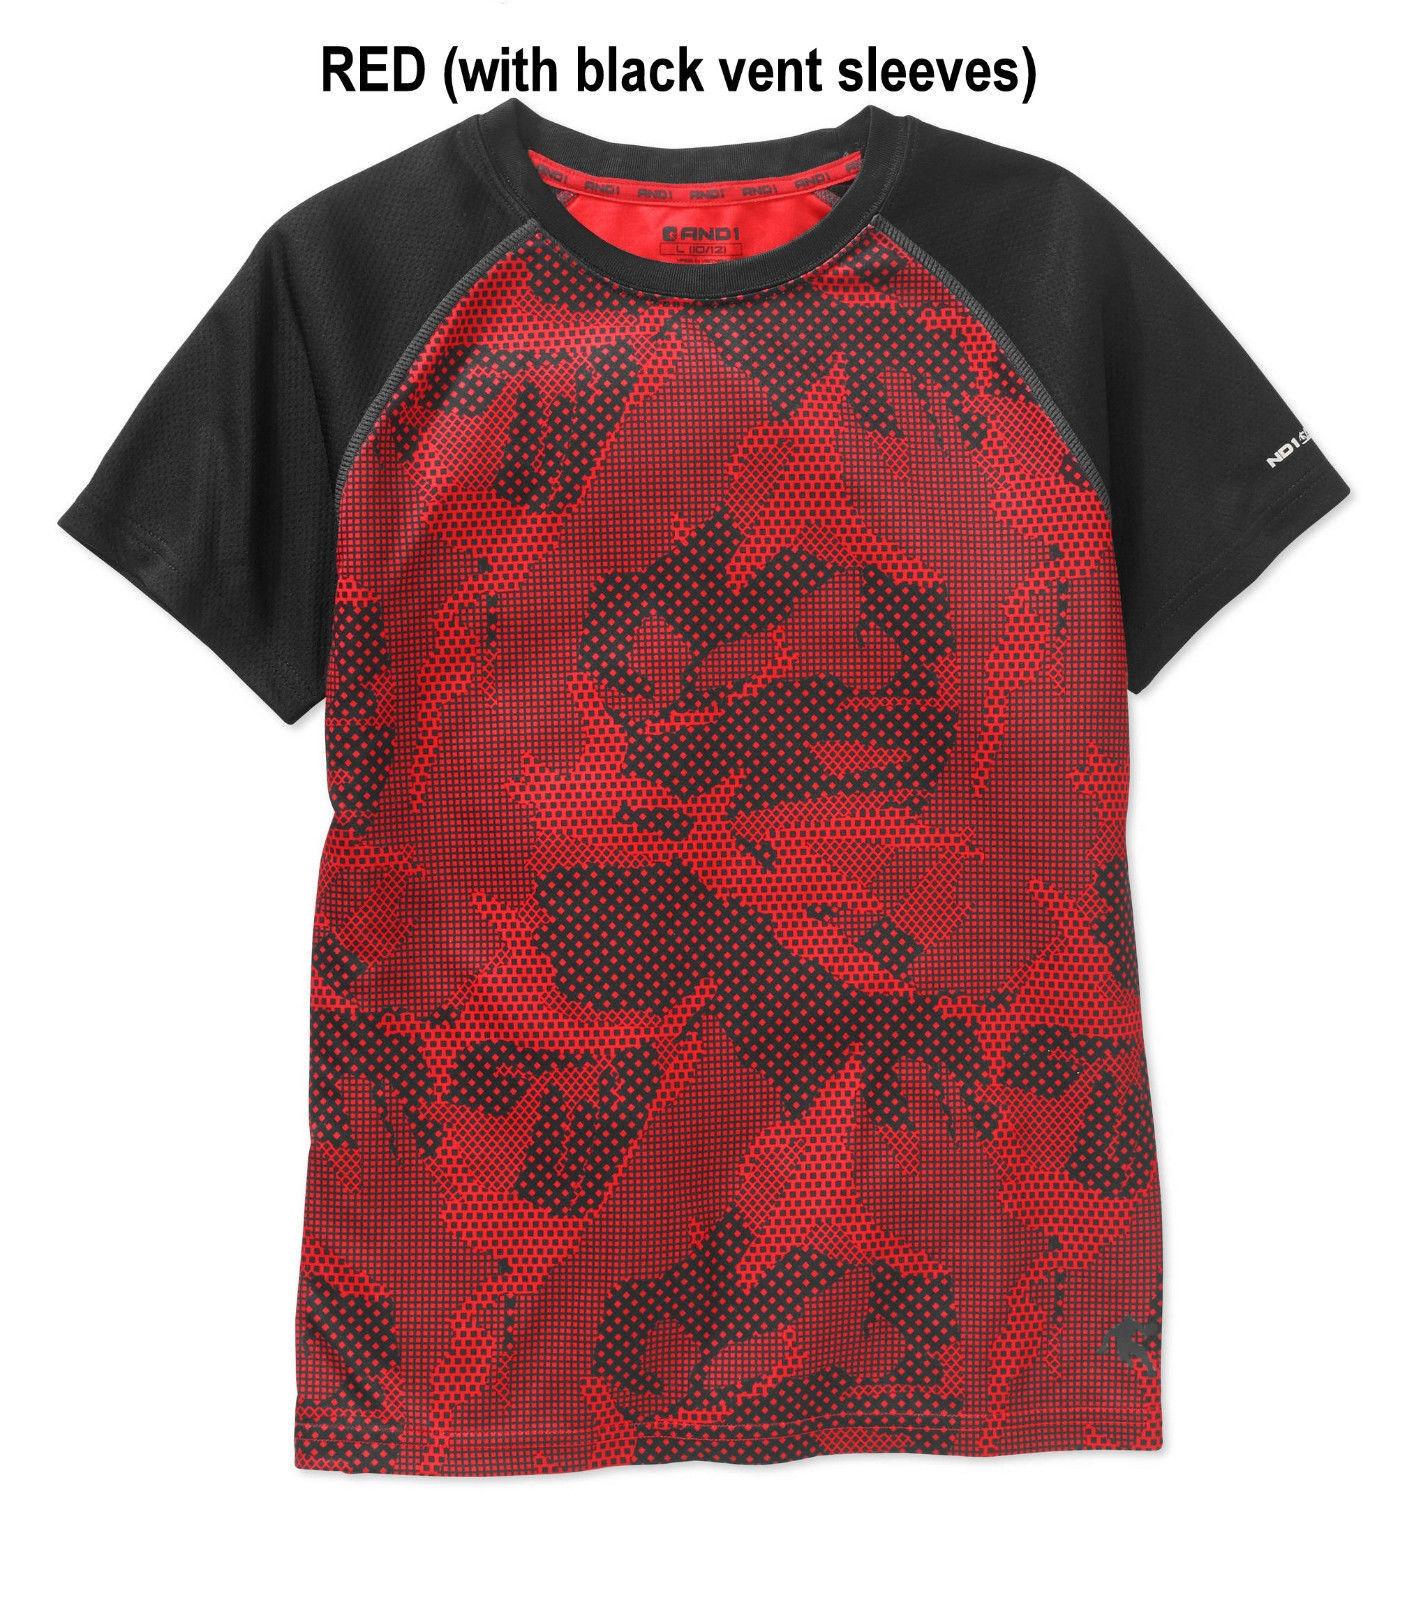 NWT Active Boys Moisture Wicking Sports Running Workout T Shirt 8-10 12-14 16-18